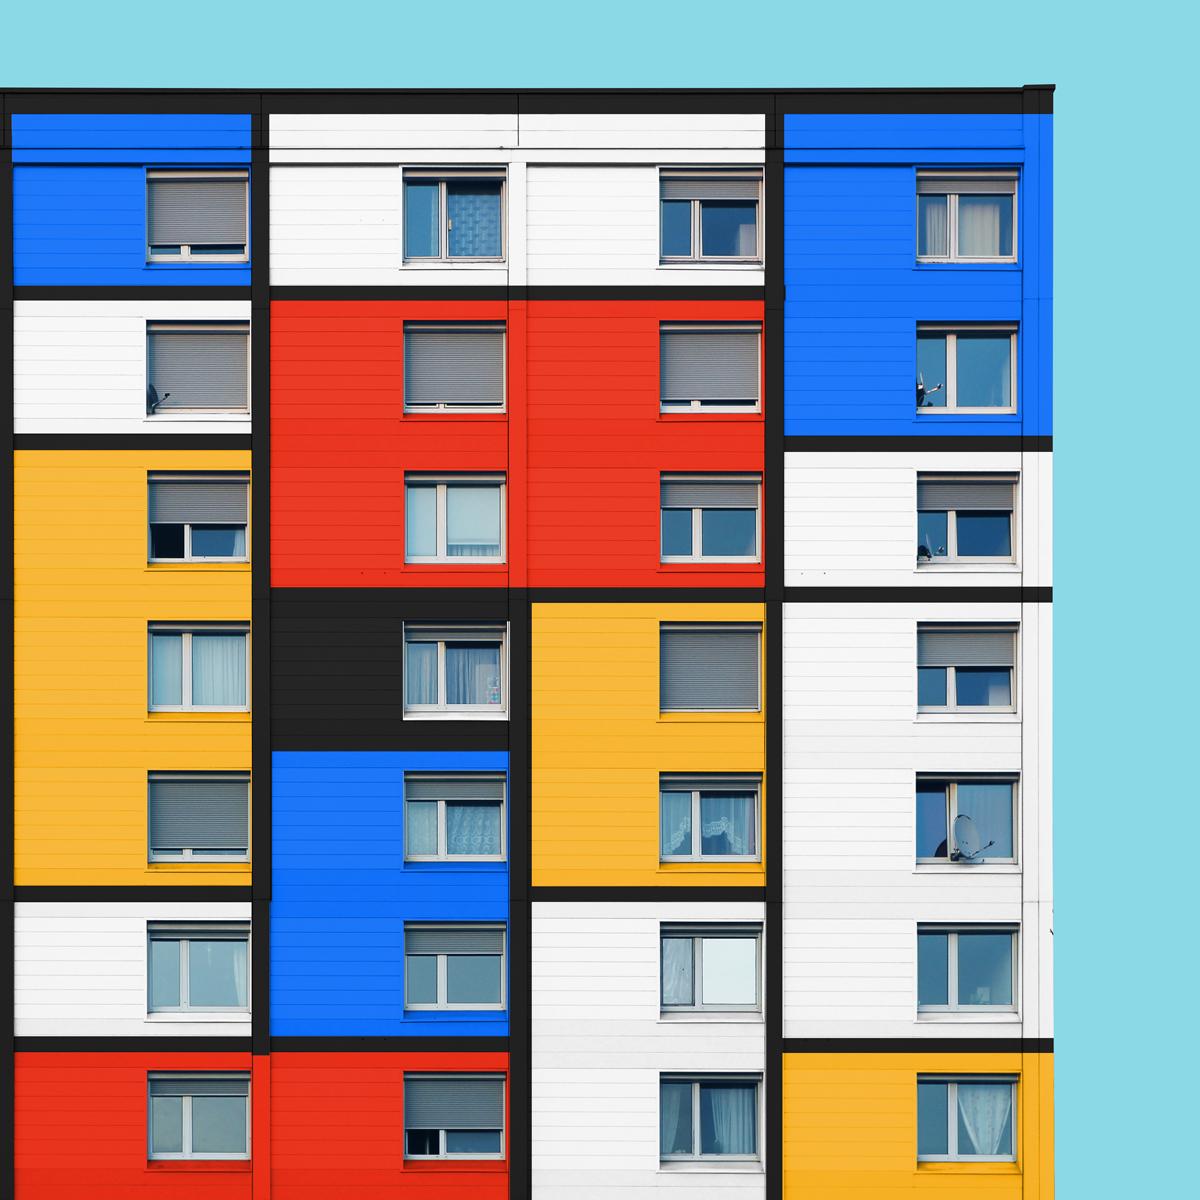 paul-eis-farbe-architektur6